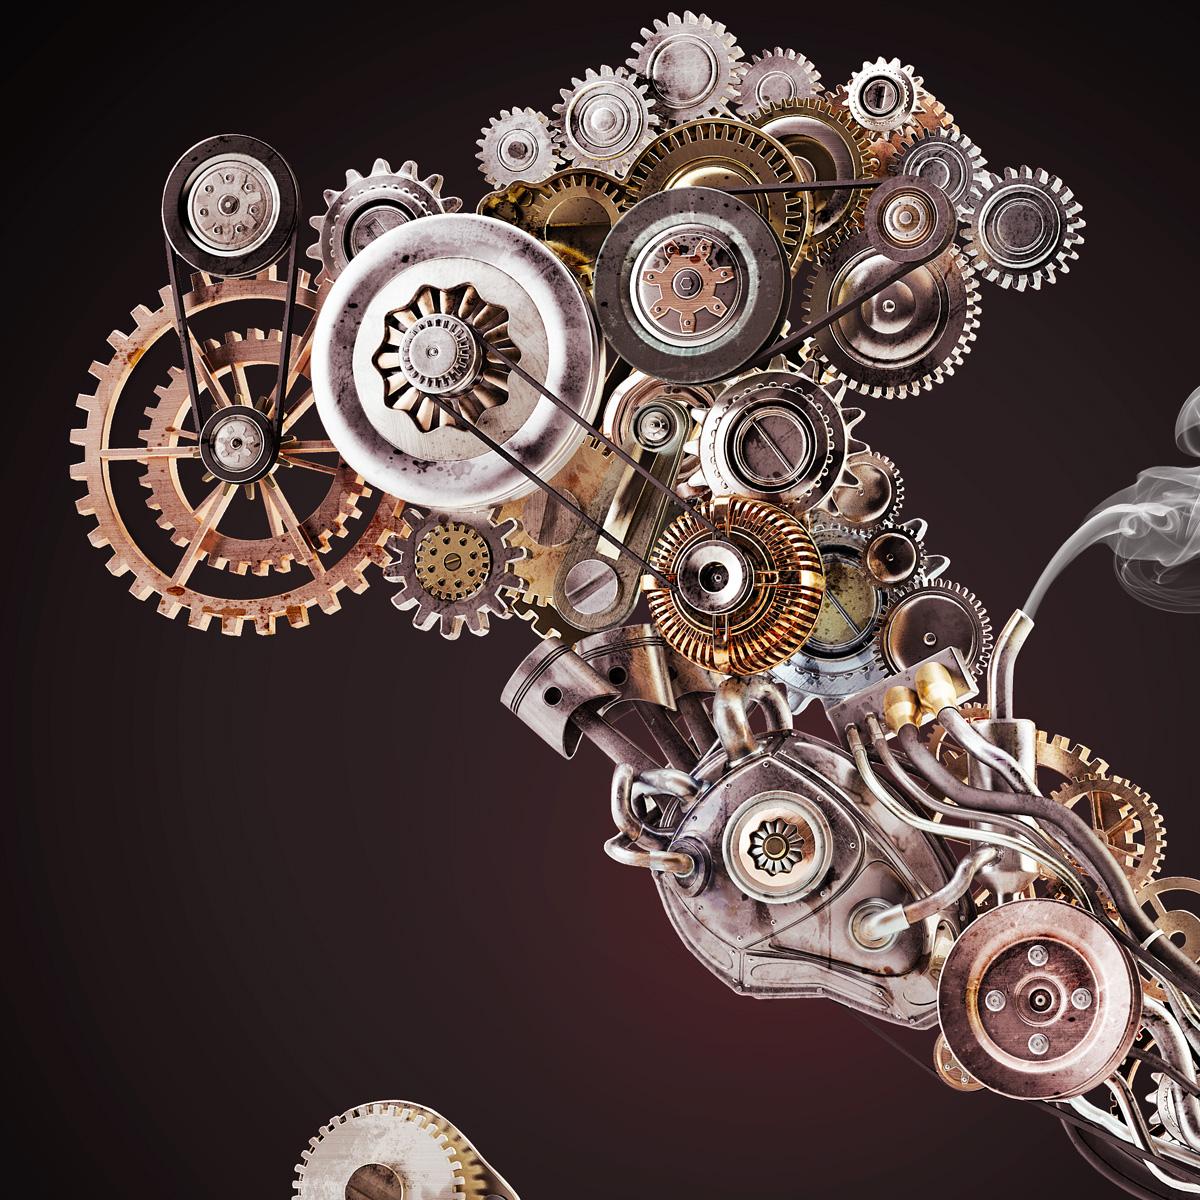 italy_gears_2